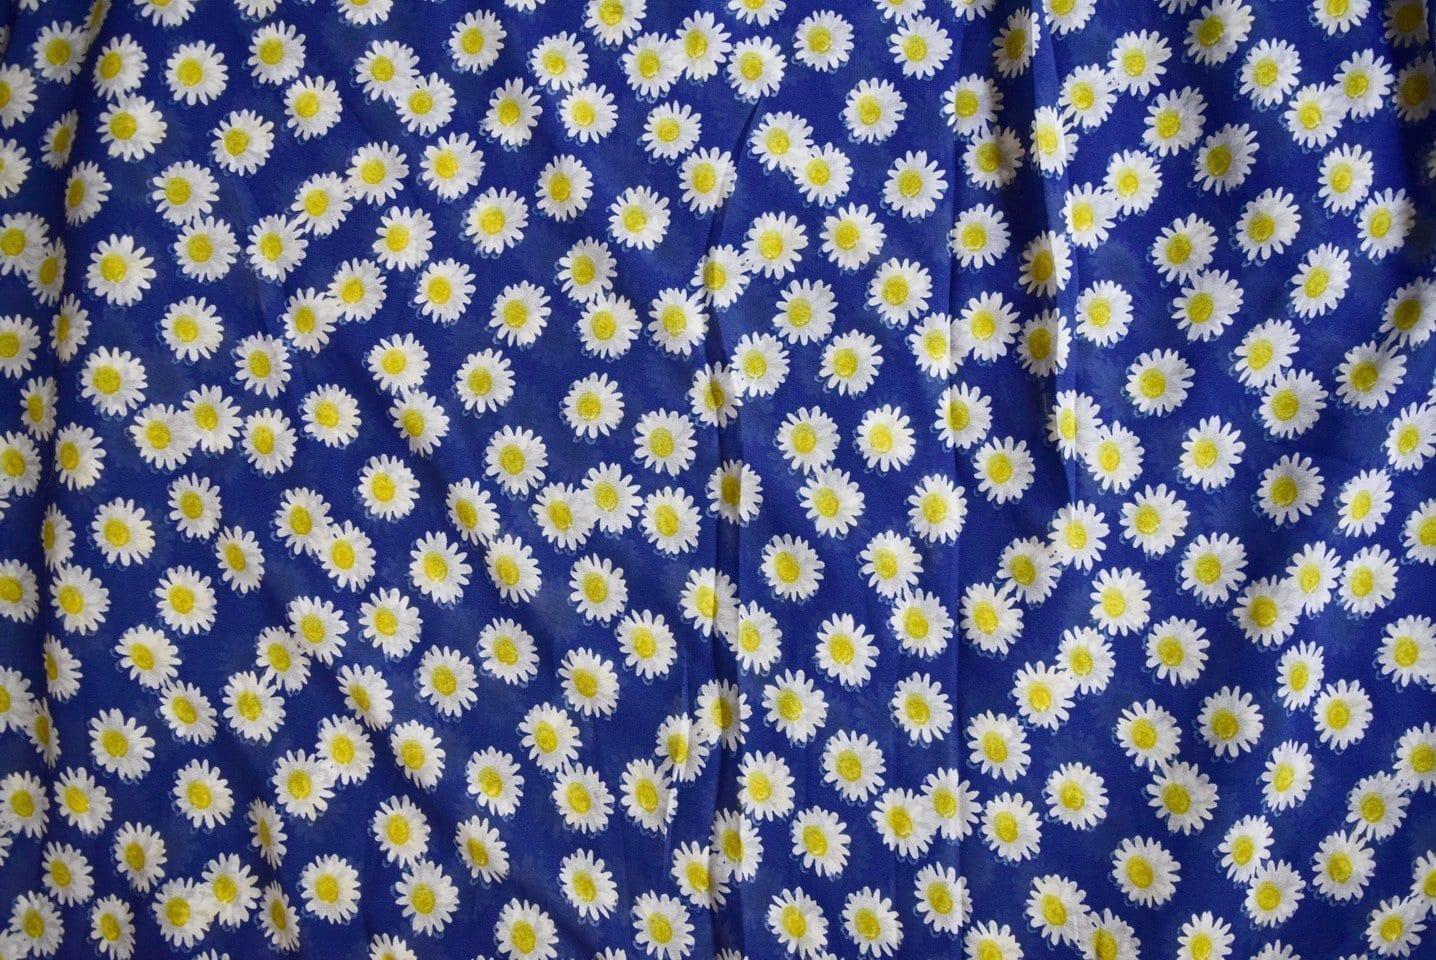 GEORGETTE PRINTED fabric for Kurti, Saree, Salwar, Dupatta GF036 2